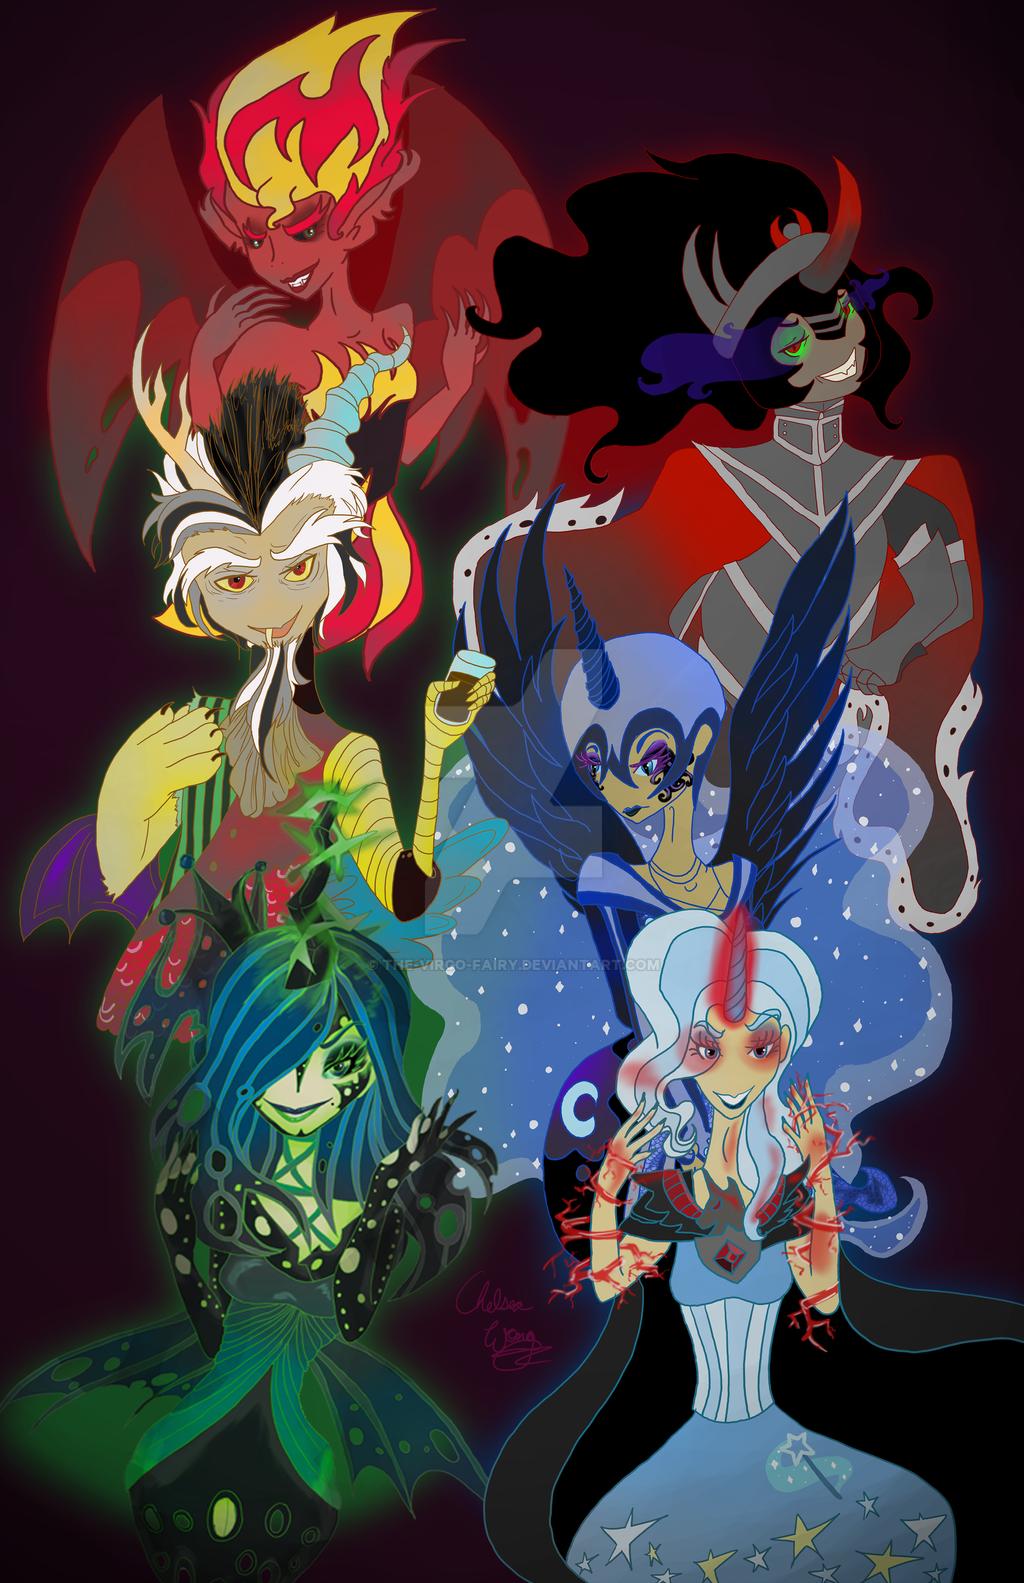 Mlp Villains Together By The Virgo Fairy On Deviantart